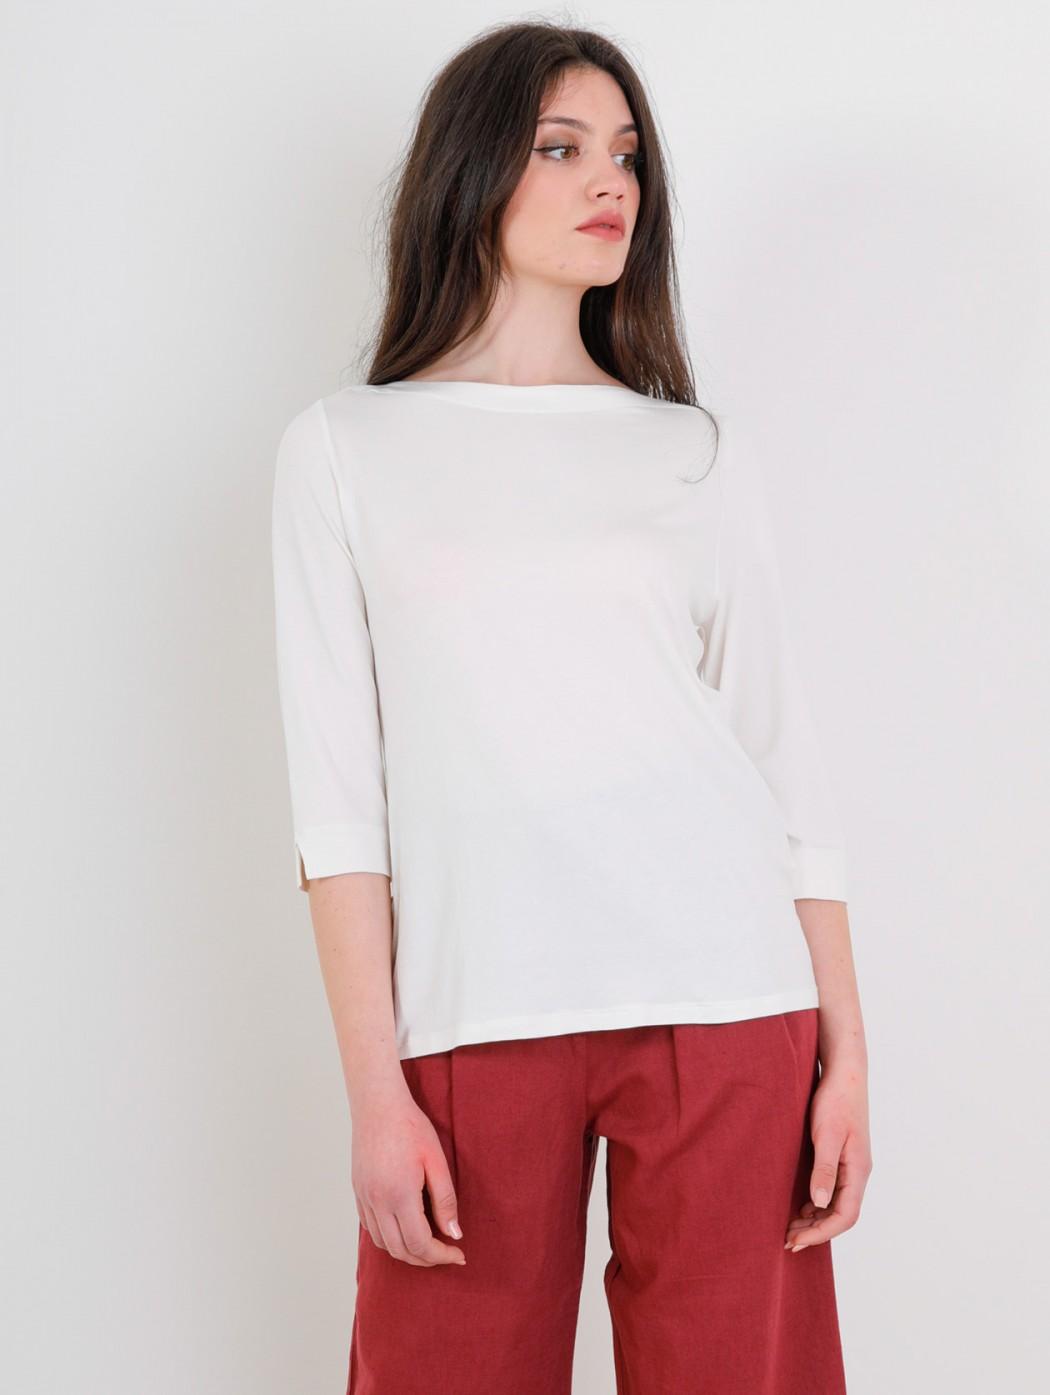 Amethist plain white simple...